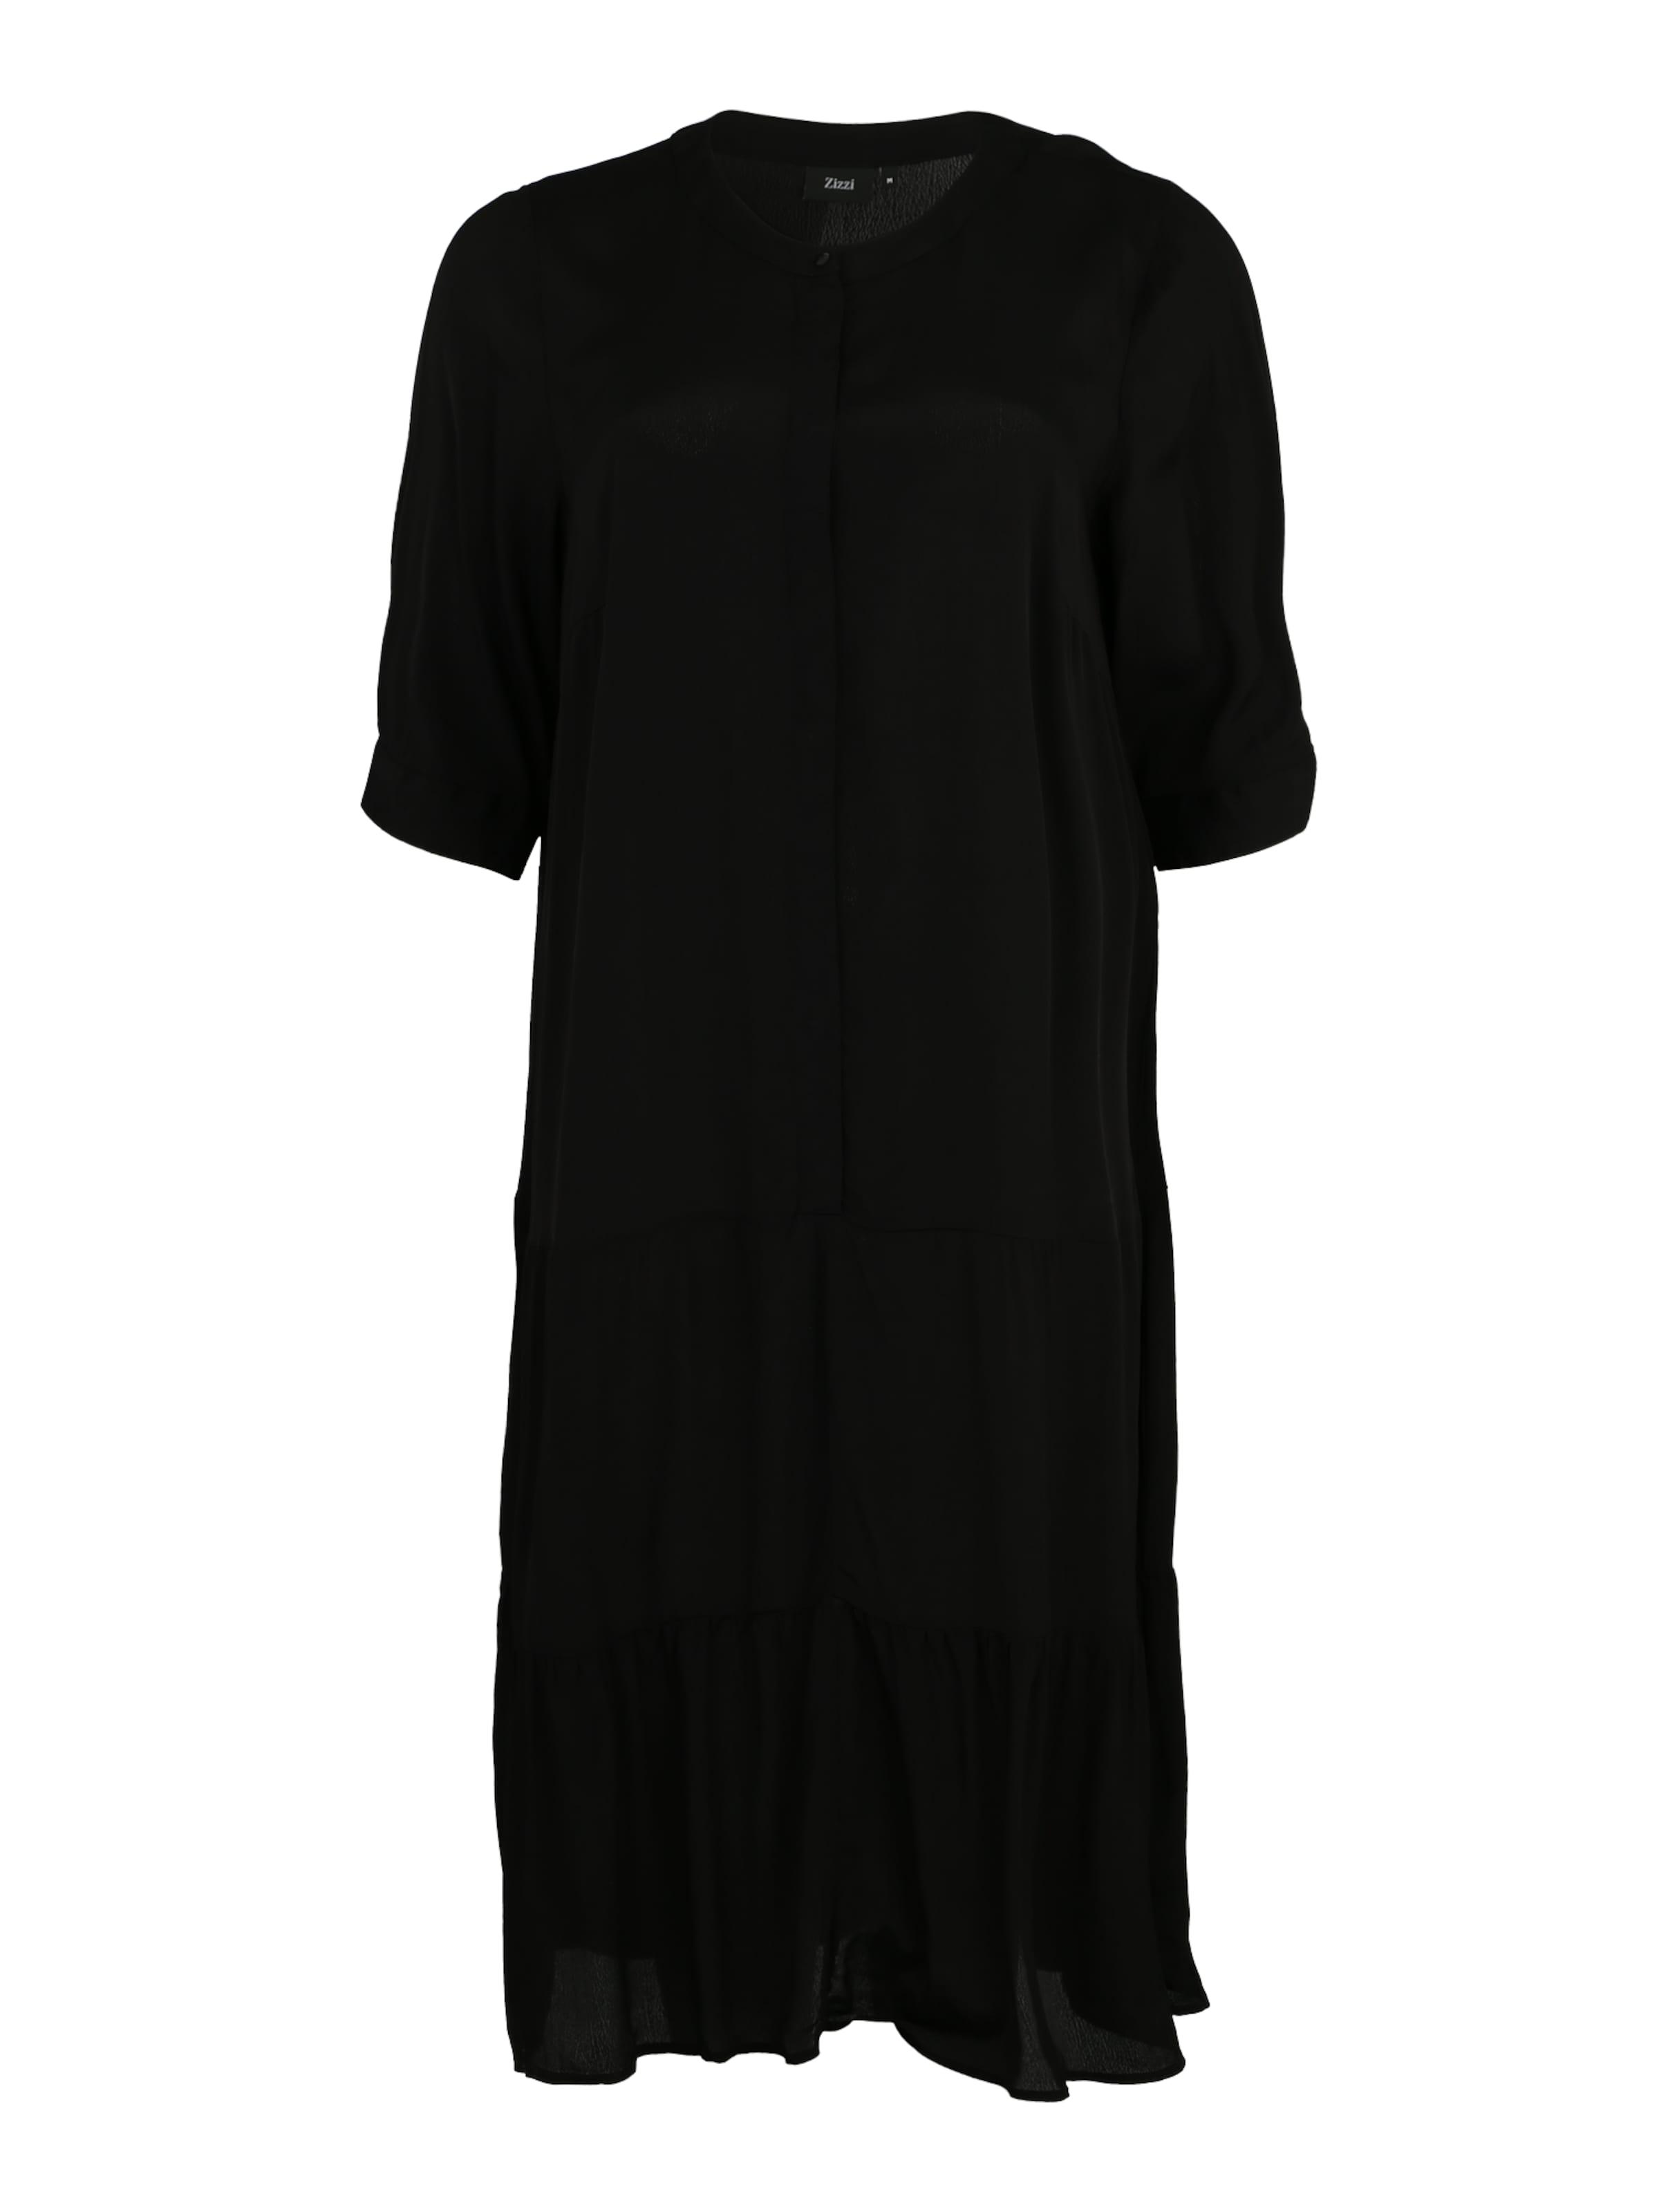 Zizzi chemise Noir 'dasy' Robe En m8nNwOv0